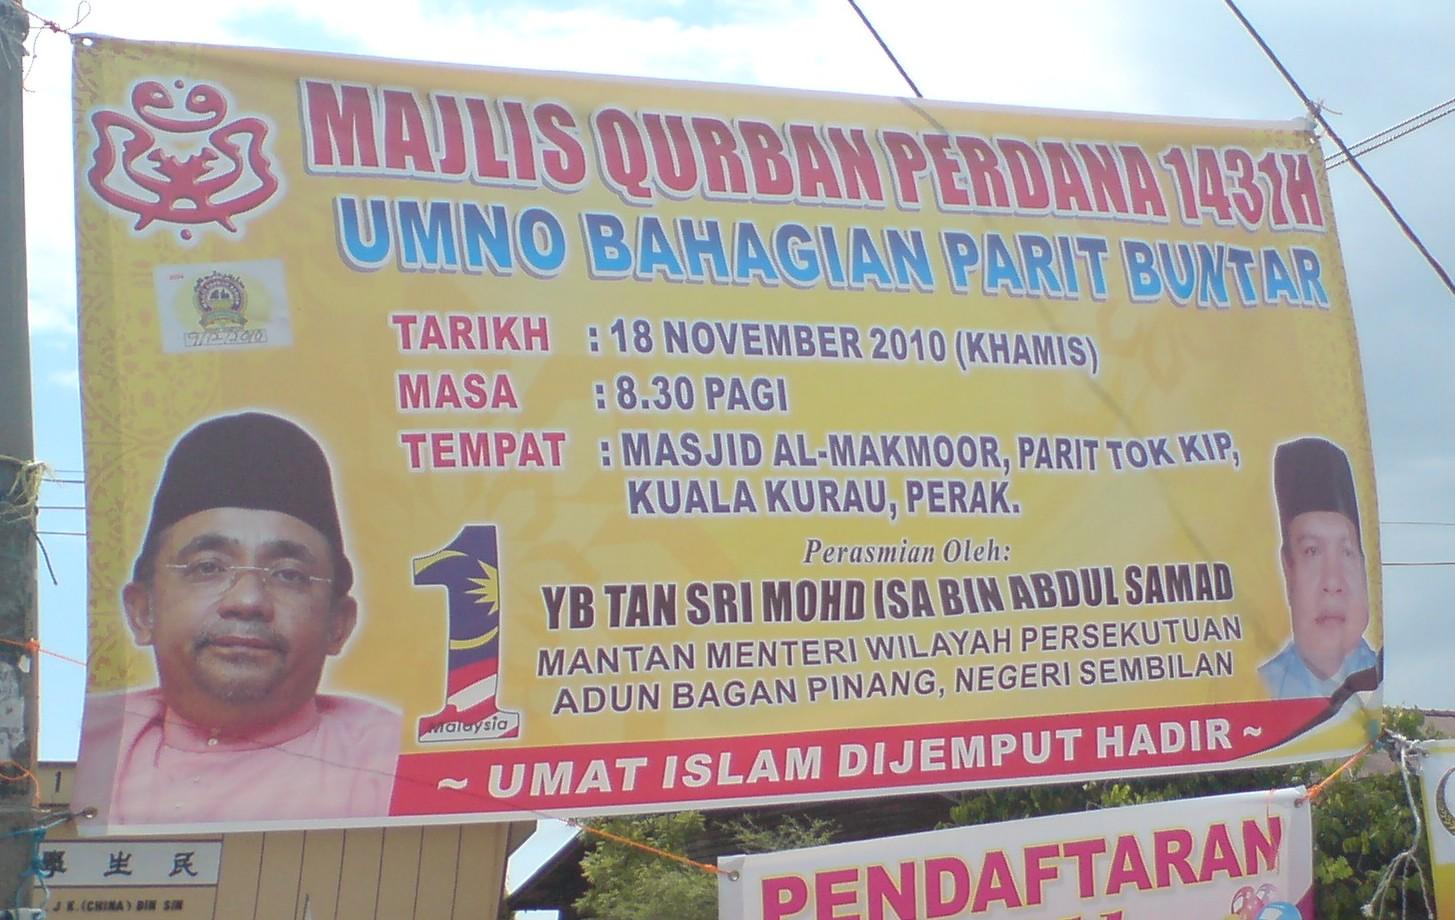 http://1.bp.blogspot.com/_4QyfTrGonI8/TOjoiLwWfeI/AAAAAAAADRE/3DW3xHo_KJo/s1600/Qurban_Umno_PB.jpg